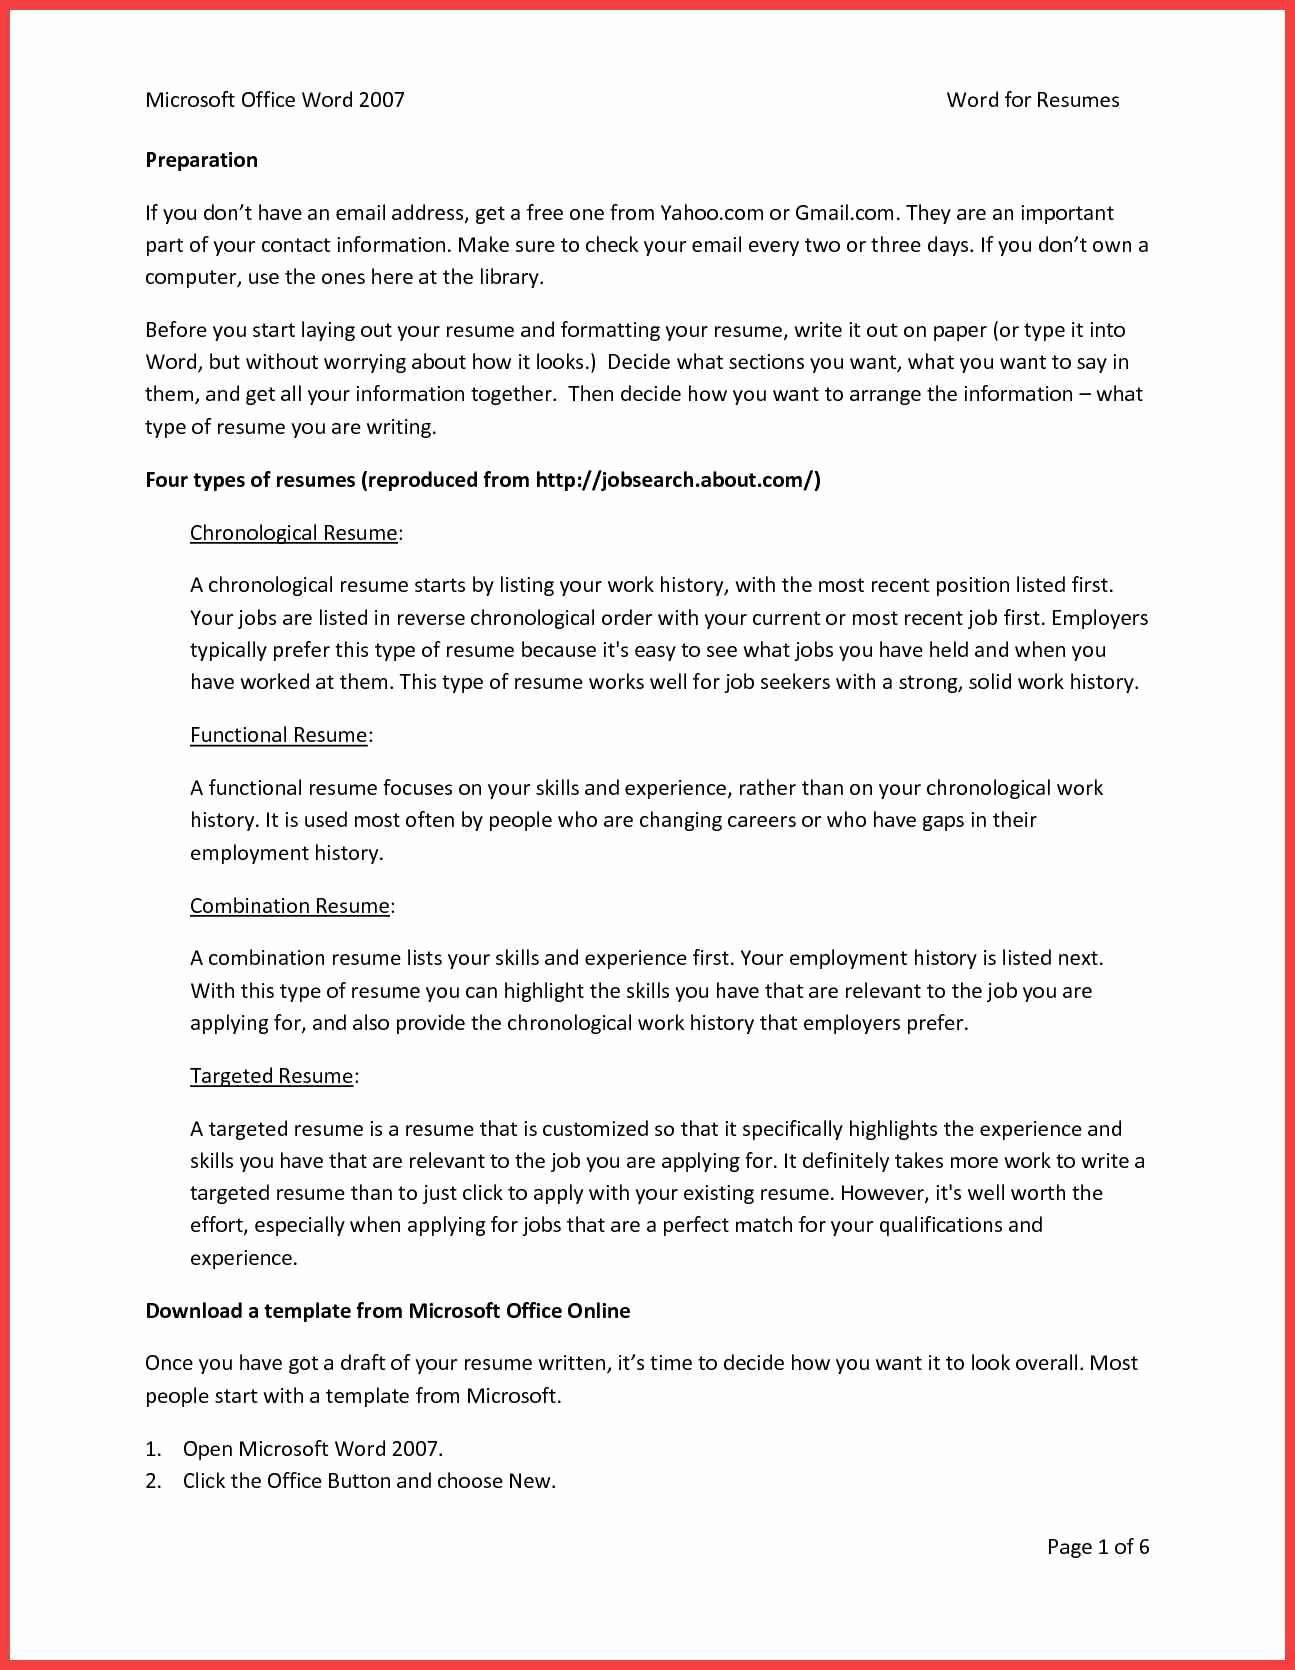 Microsoft Word Resume Templates 2007 Elegant Skills Resume Template Word